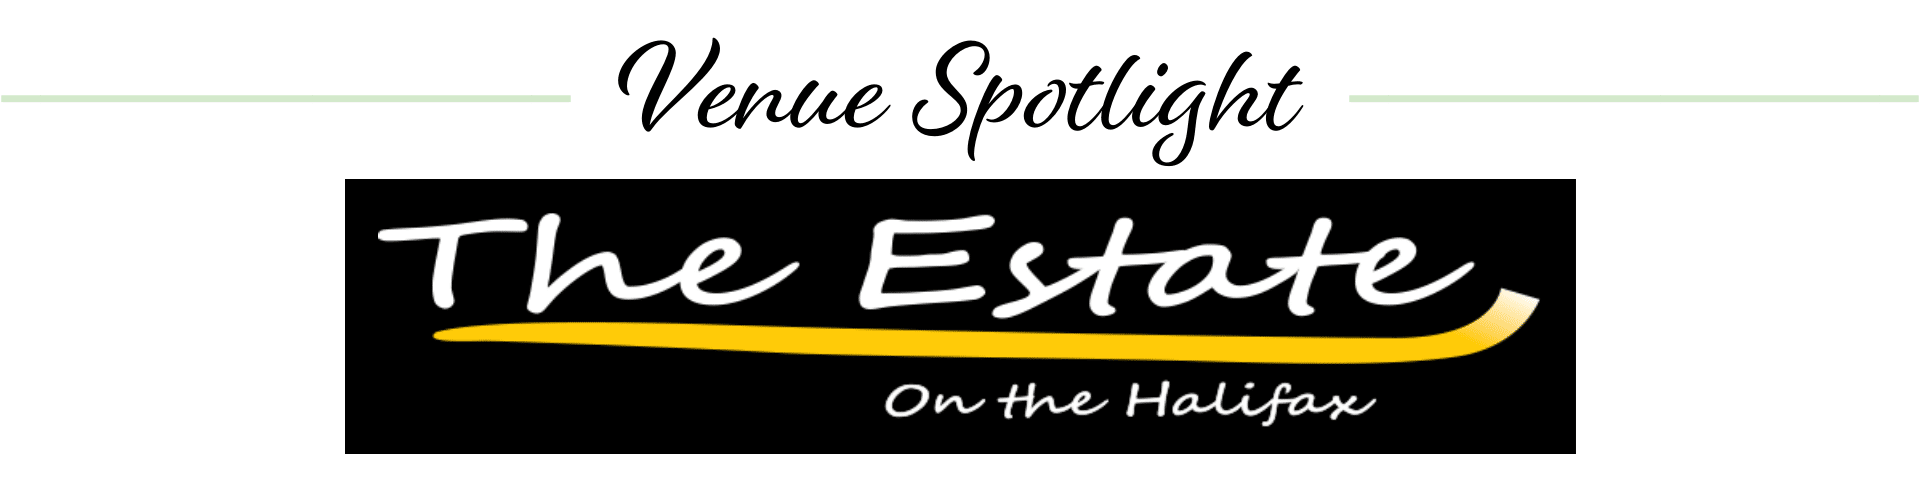 Estate on the Halifax logo